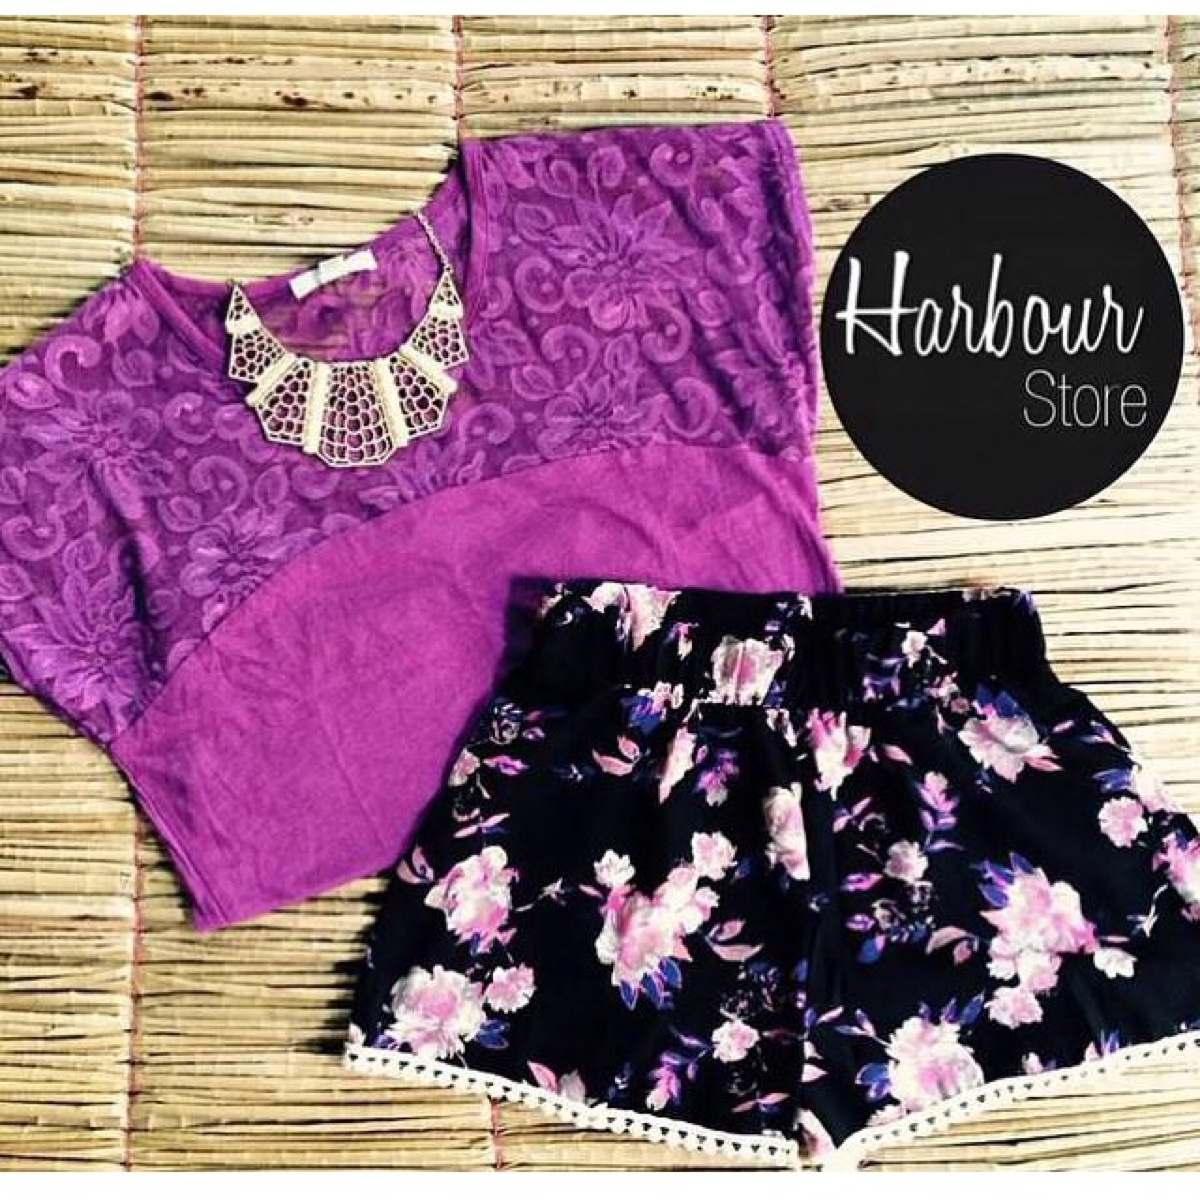 ropa fashion moda importada original para dama y chicas